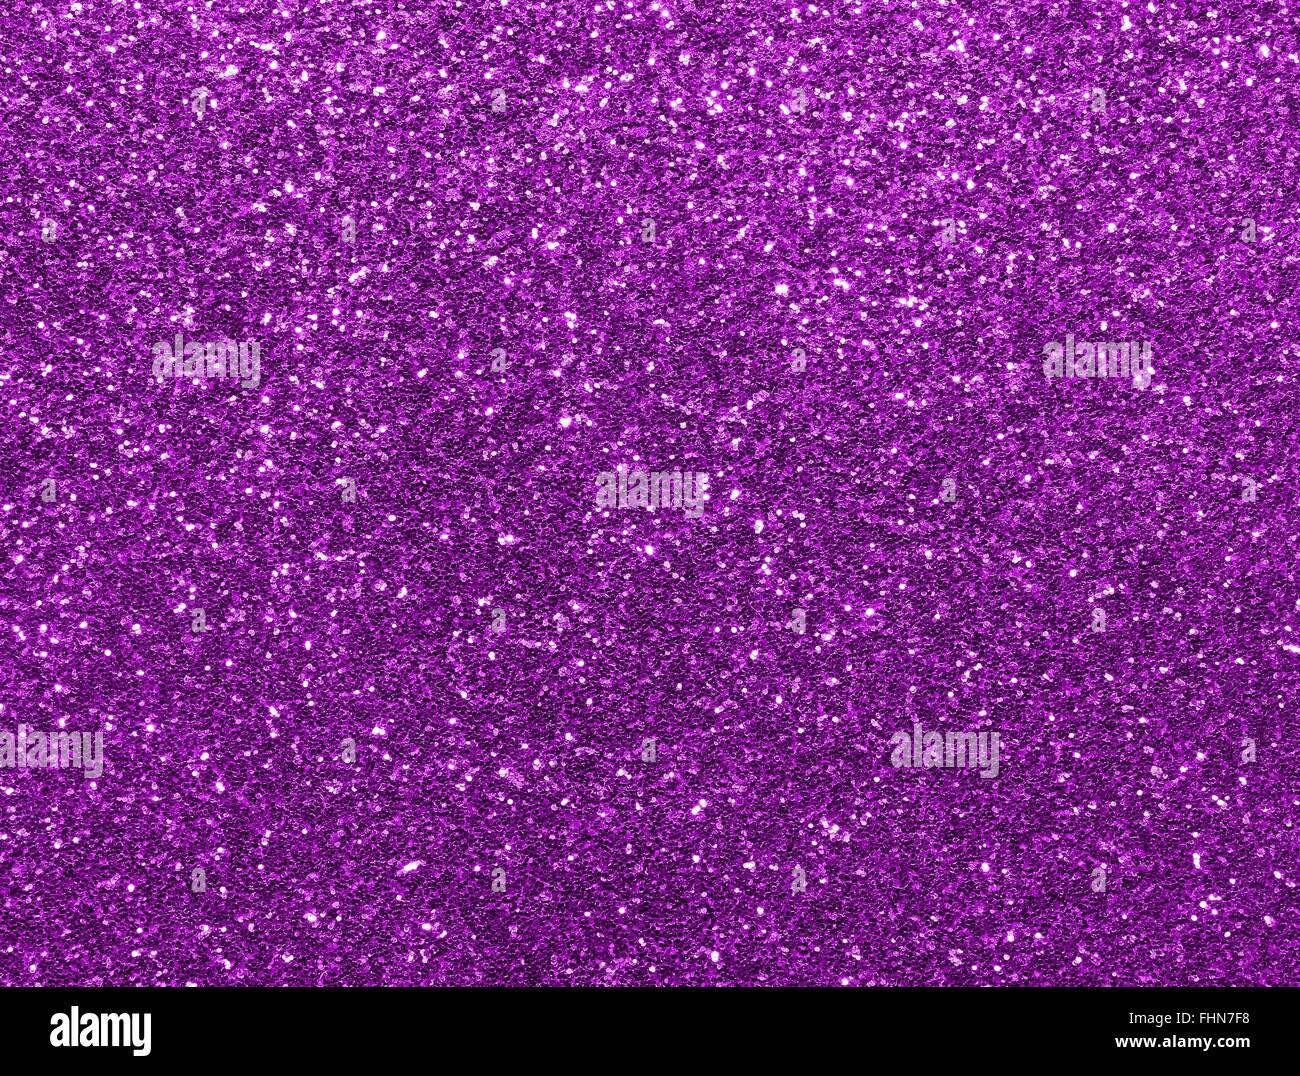 Purple Falling Circles Wallpaper Large Background Texture Purple Glitter Bright Shiny